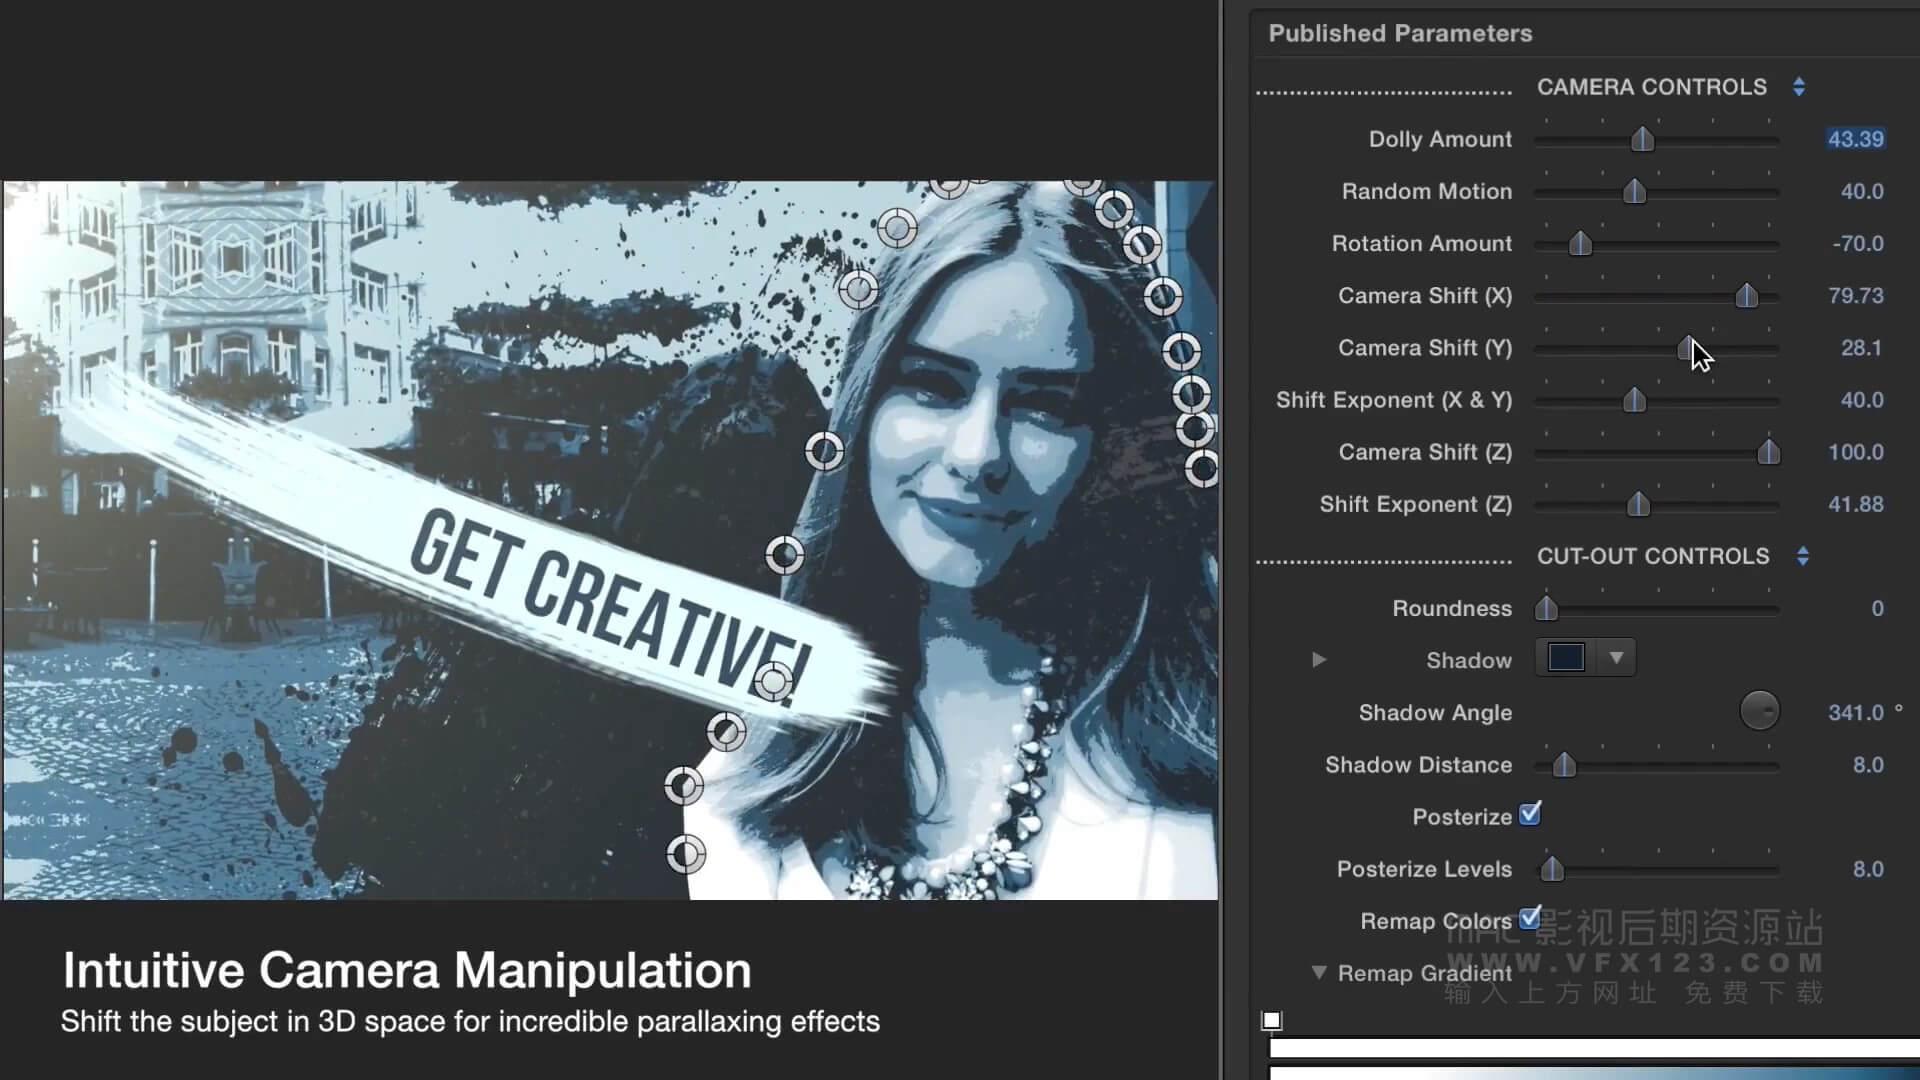 Fcpx插件 画面帧冻结泼墨飞溅动态视觉效果 ProFreeze Splatter